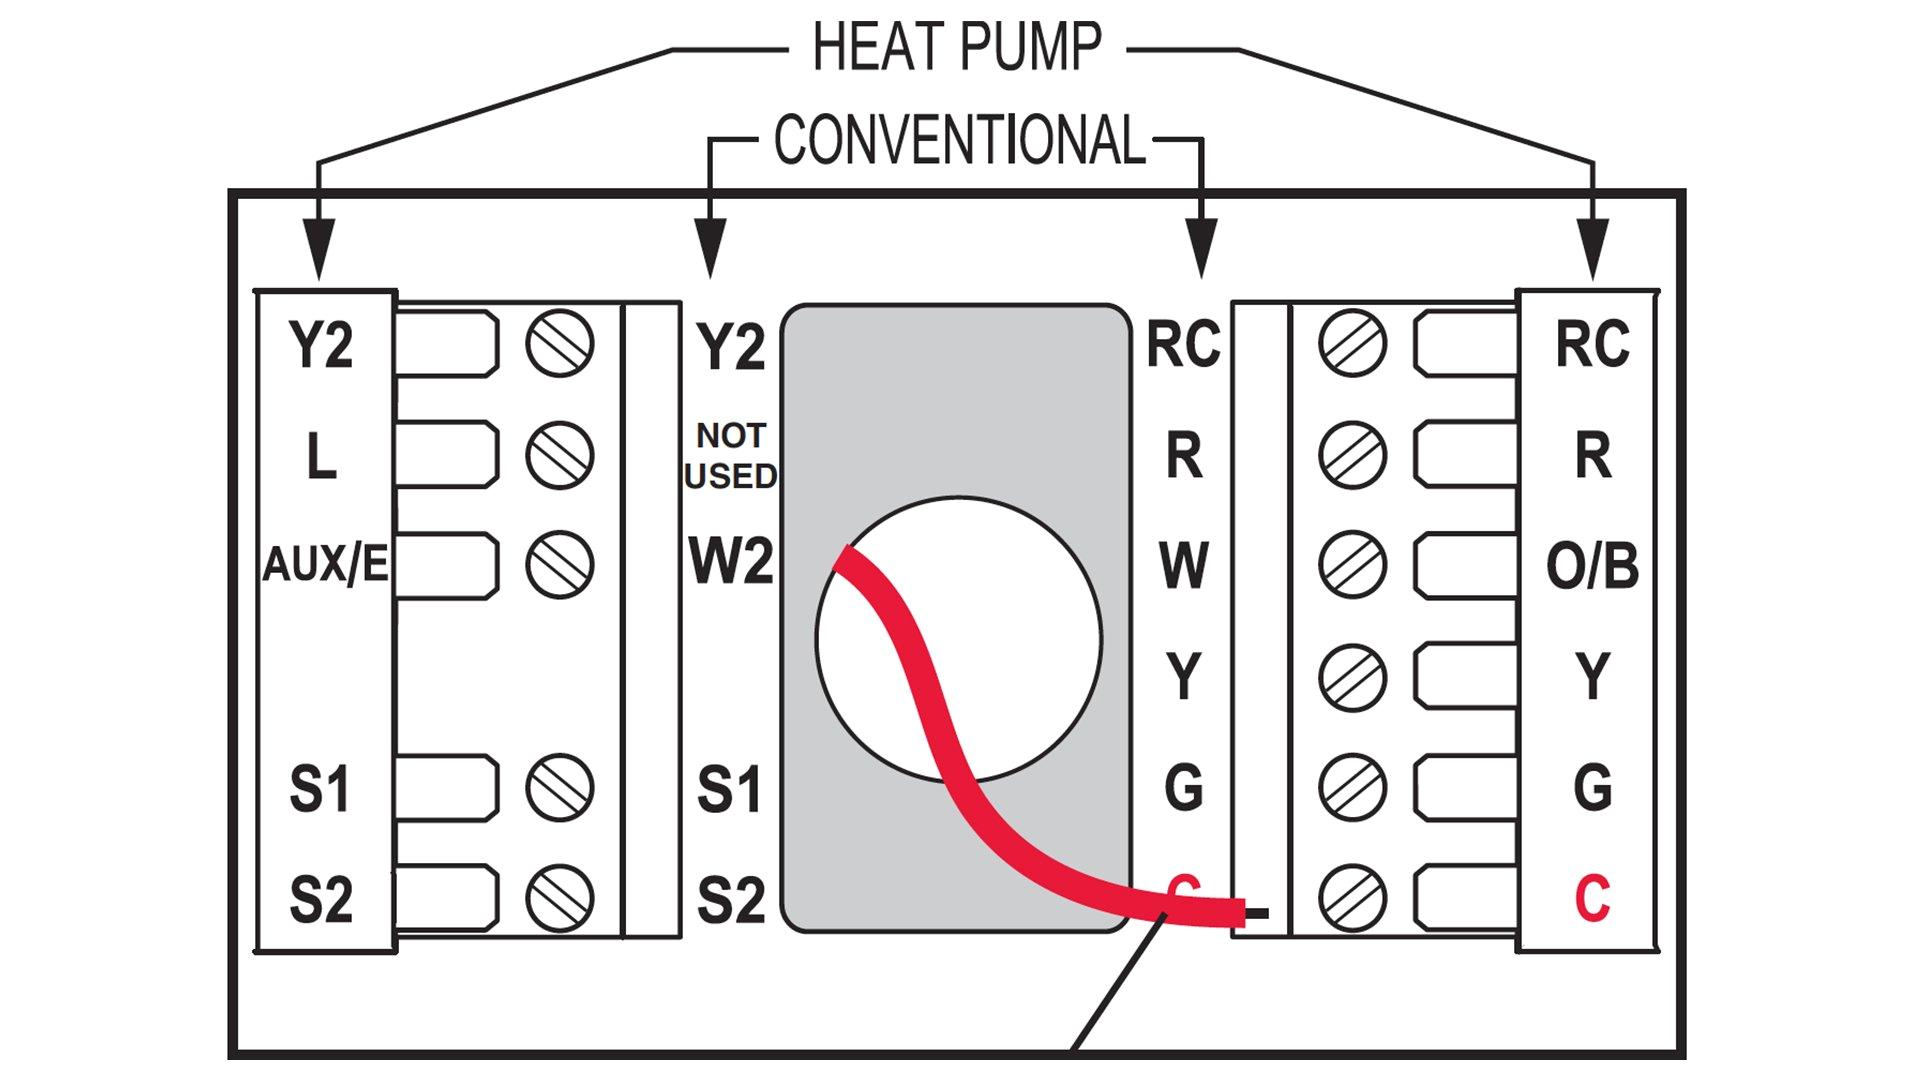 honeywell thermostat wiring instructions diy house help honeywell thermostat wiring diagram lyric honeywell thermostat wiring diagrams